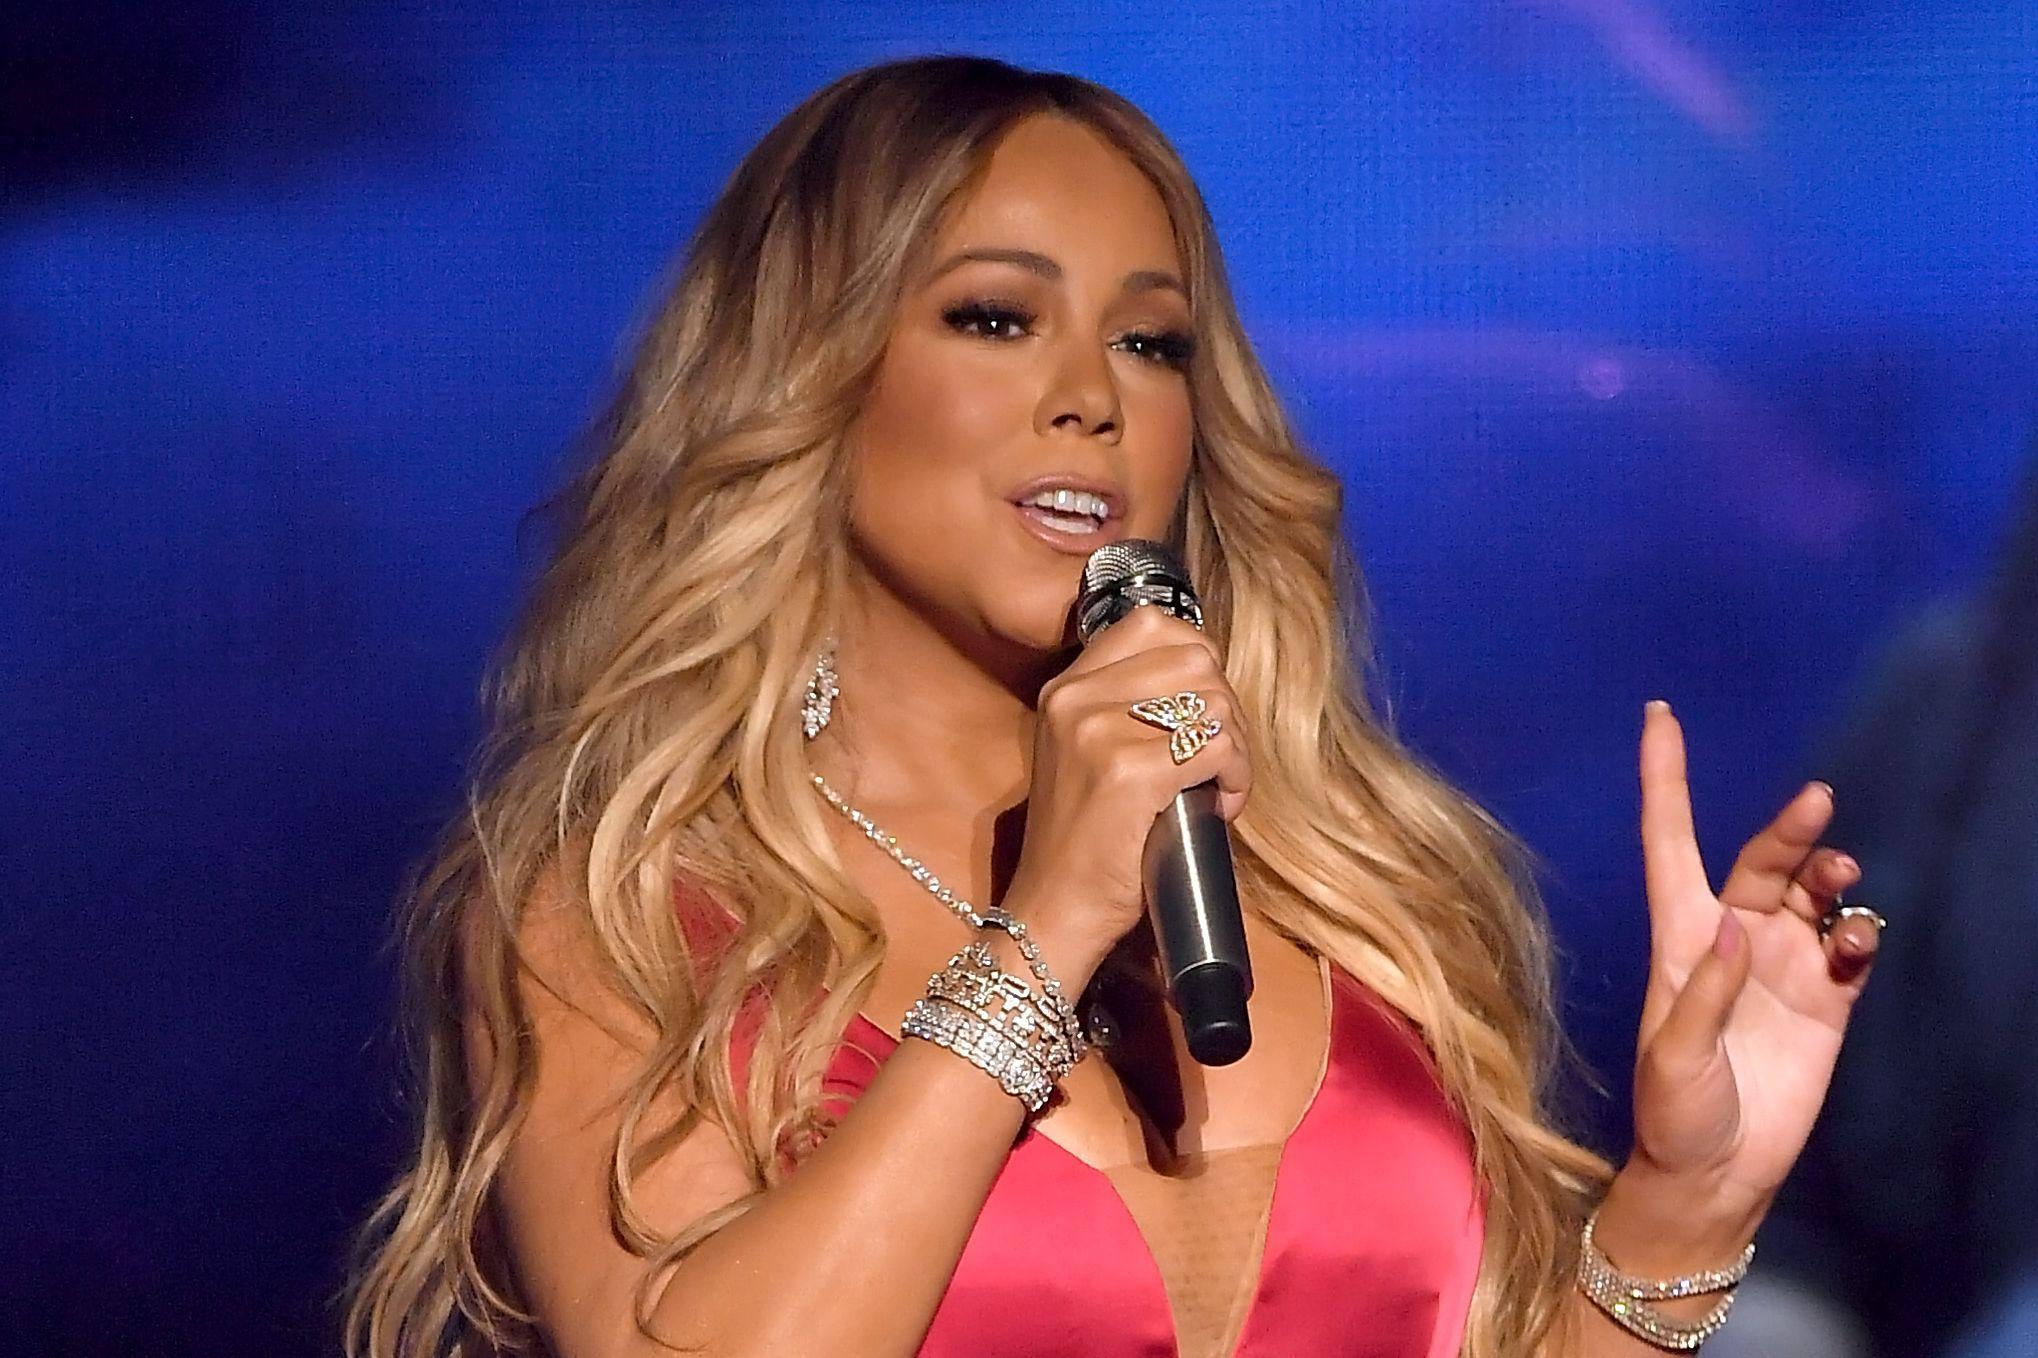 Michael bolton we re not making love anymore Mariah Carey Michael Bolton We Re Not Making Love Anymore Lyrics Lyricsfa Com